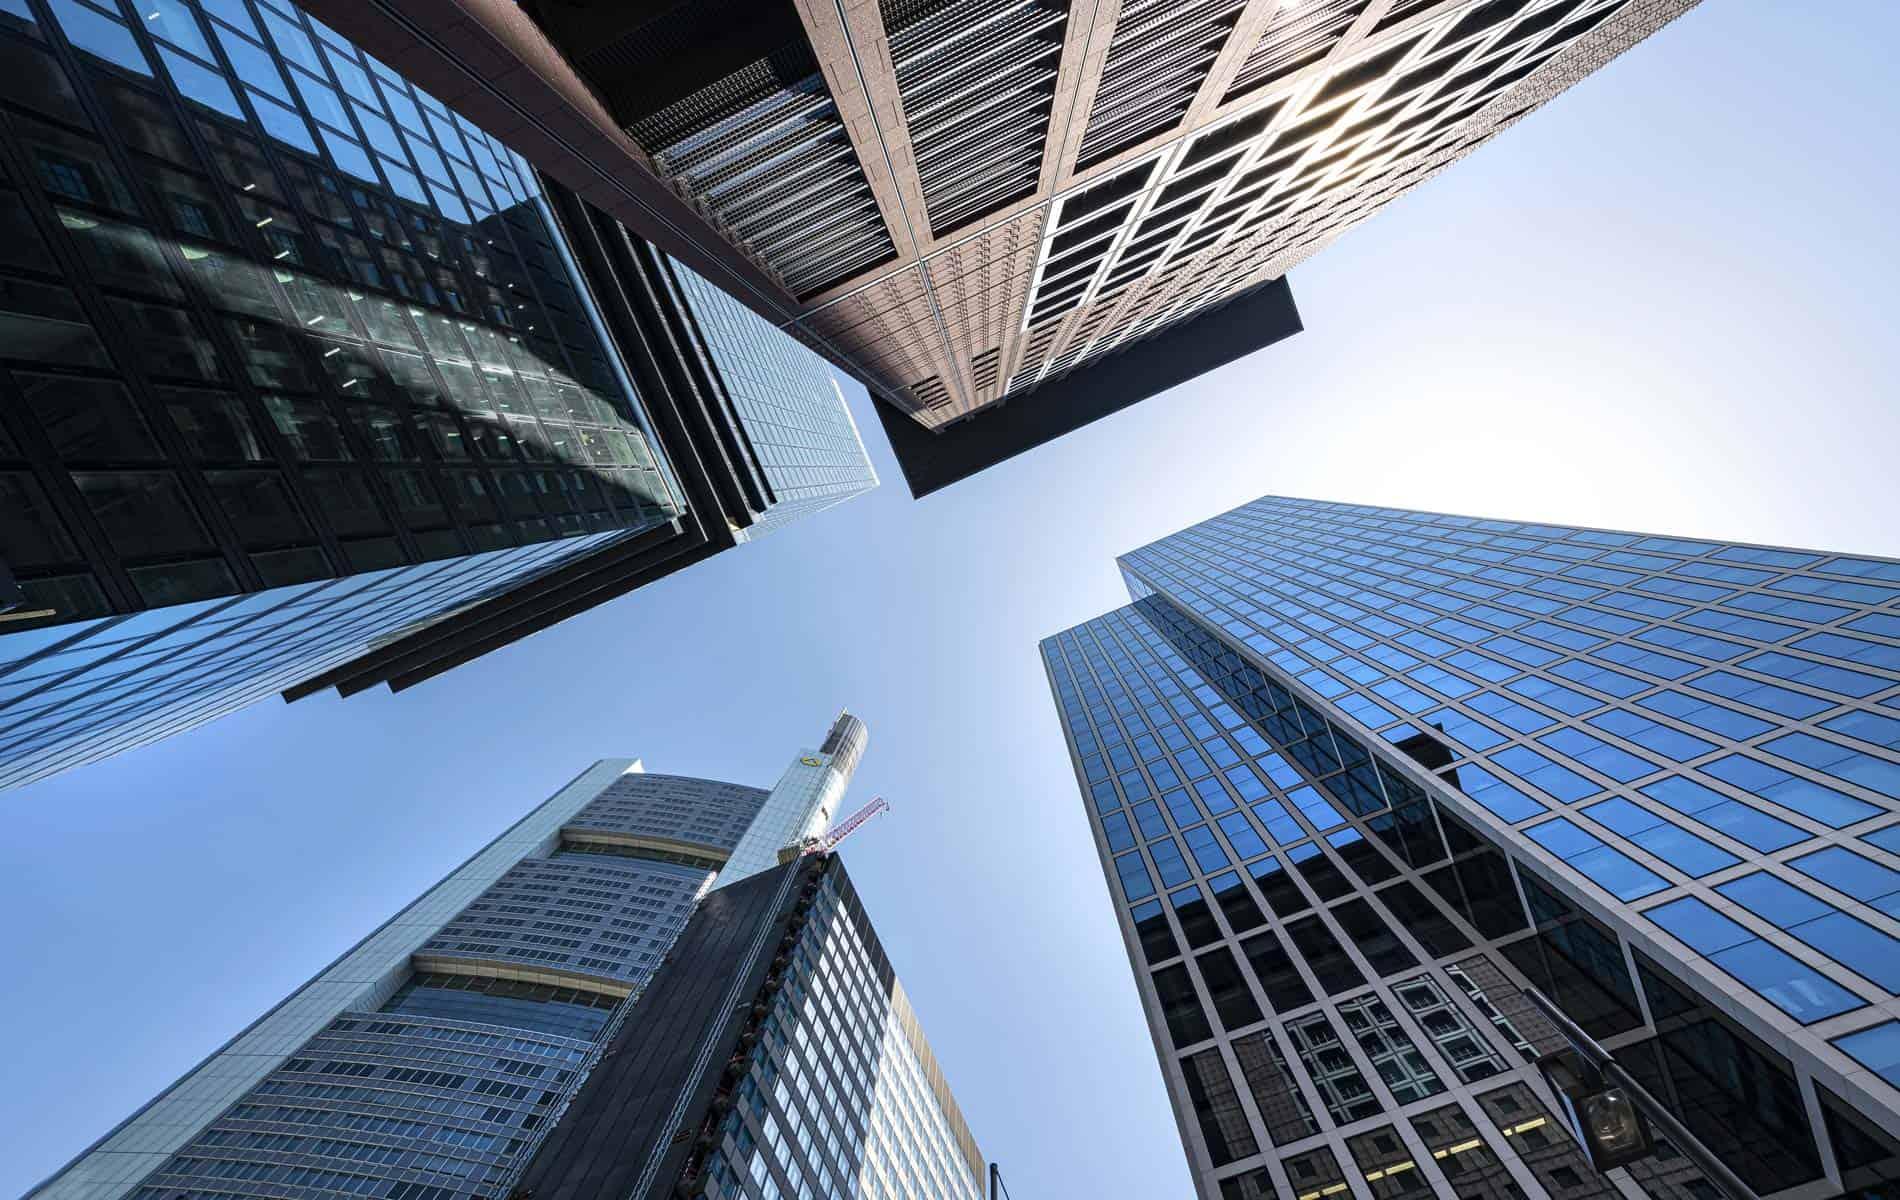 Haftungsrisiken bei der Sicherheitsstellung an Banken